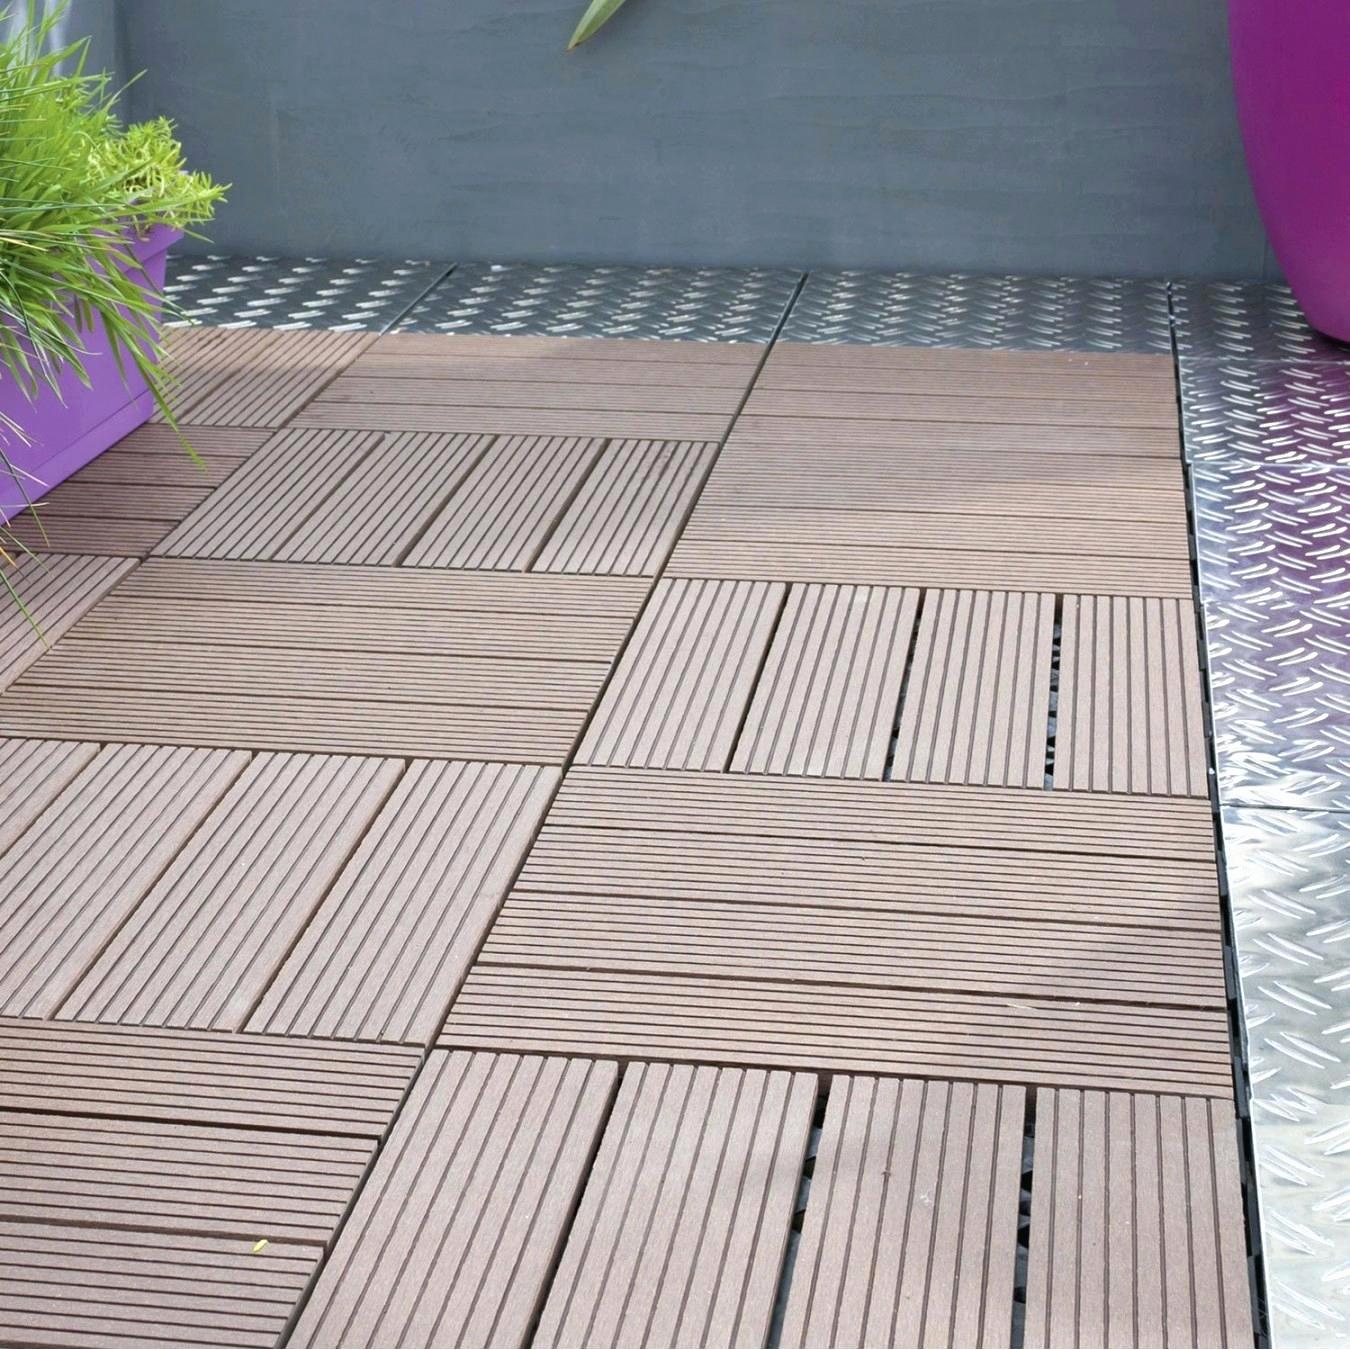 Pose Terrasse Composite Sur Plot Leroy Merlin Cartier Love